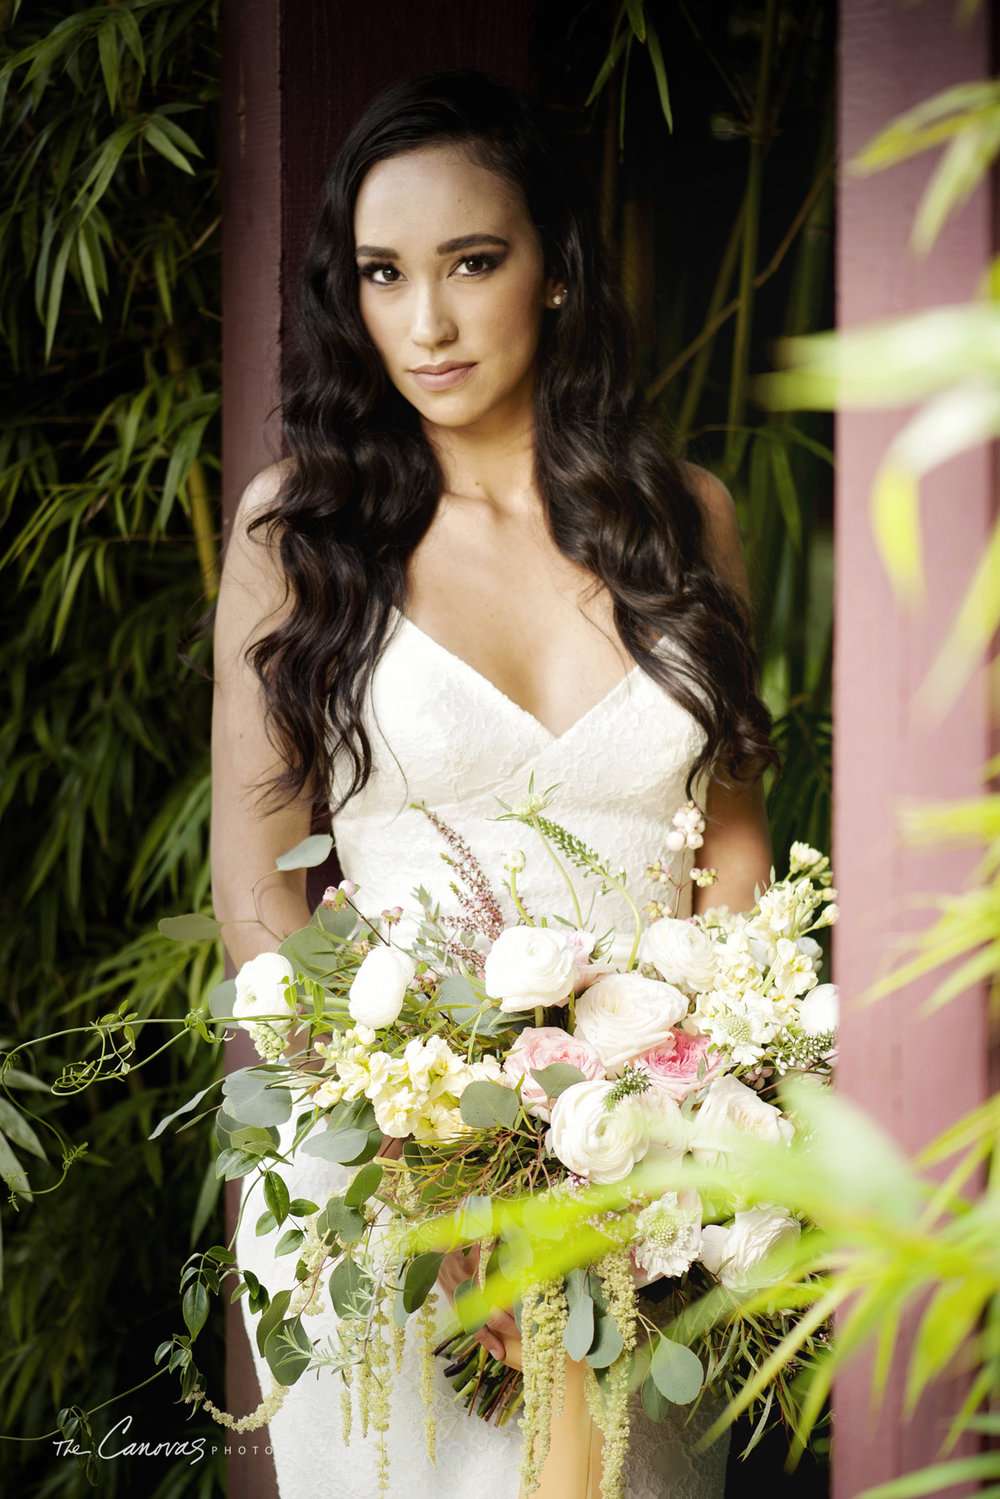 182_Stetson_DeLand_wedding_The_Canovas_Photography.jpg